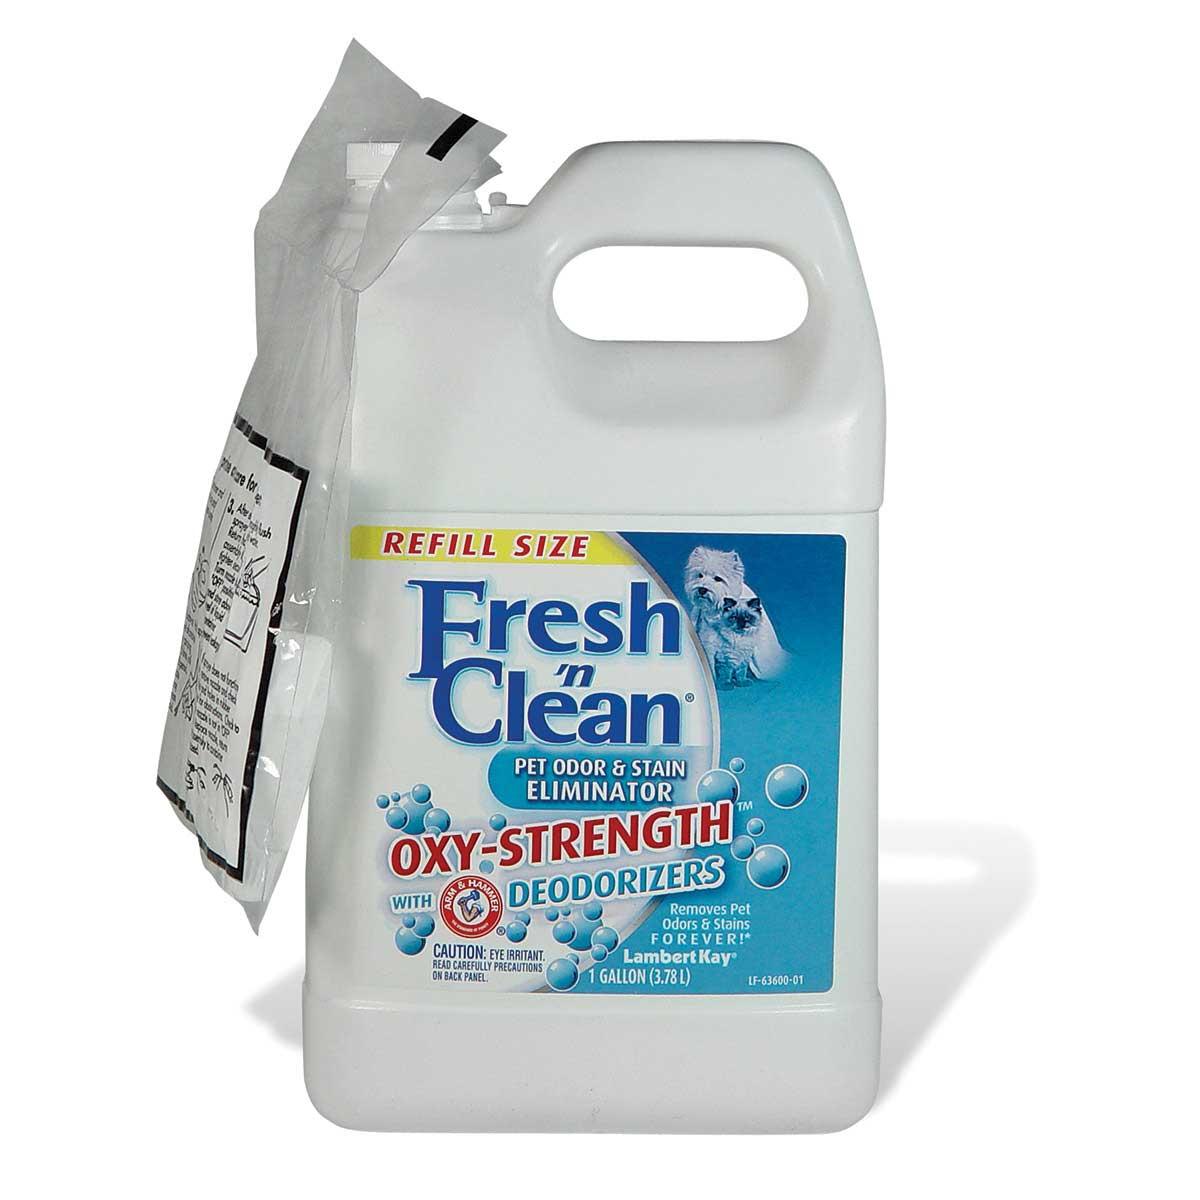 Fresh 'n Clean Oxy Strength Odor/Stain Eliminator - Gallon